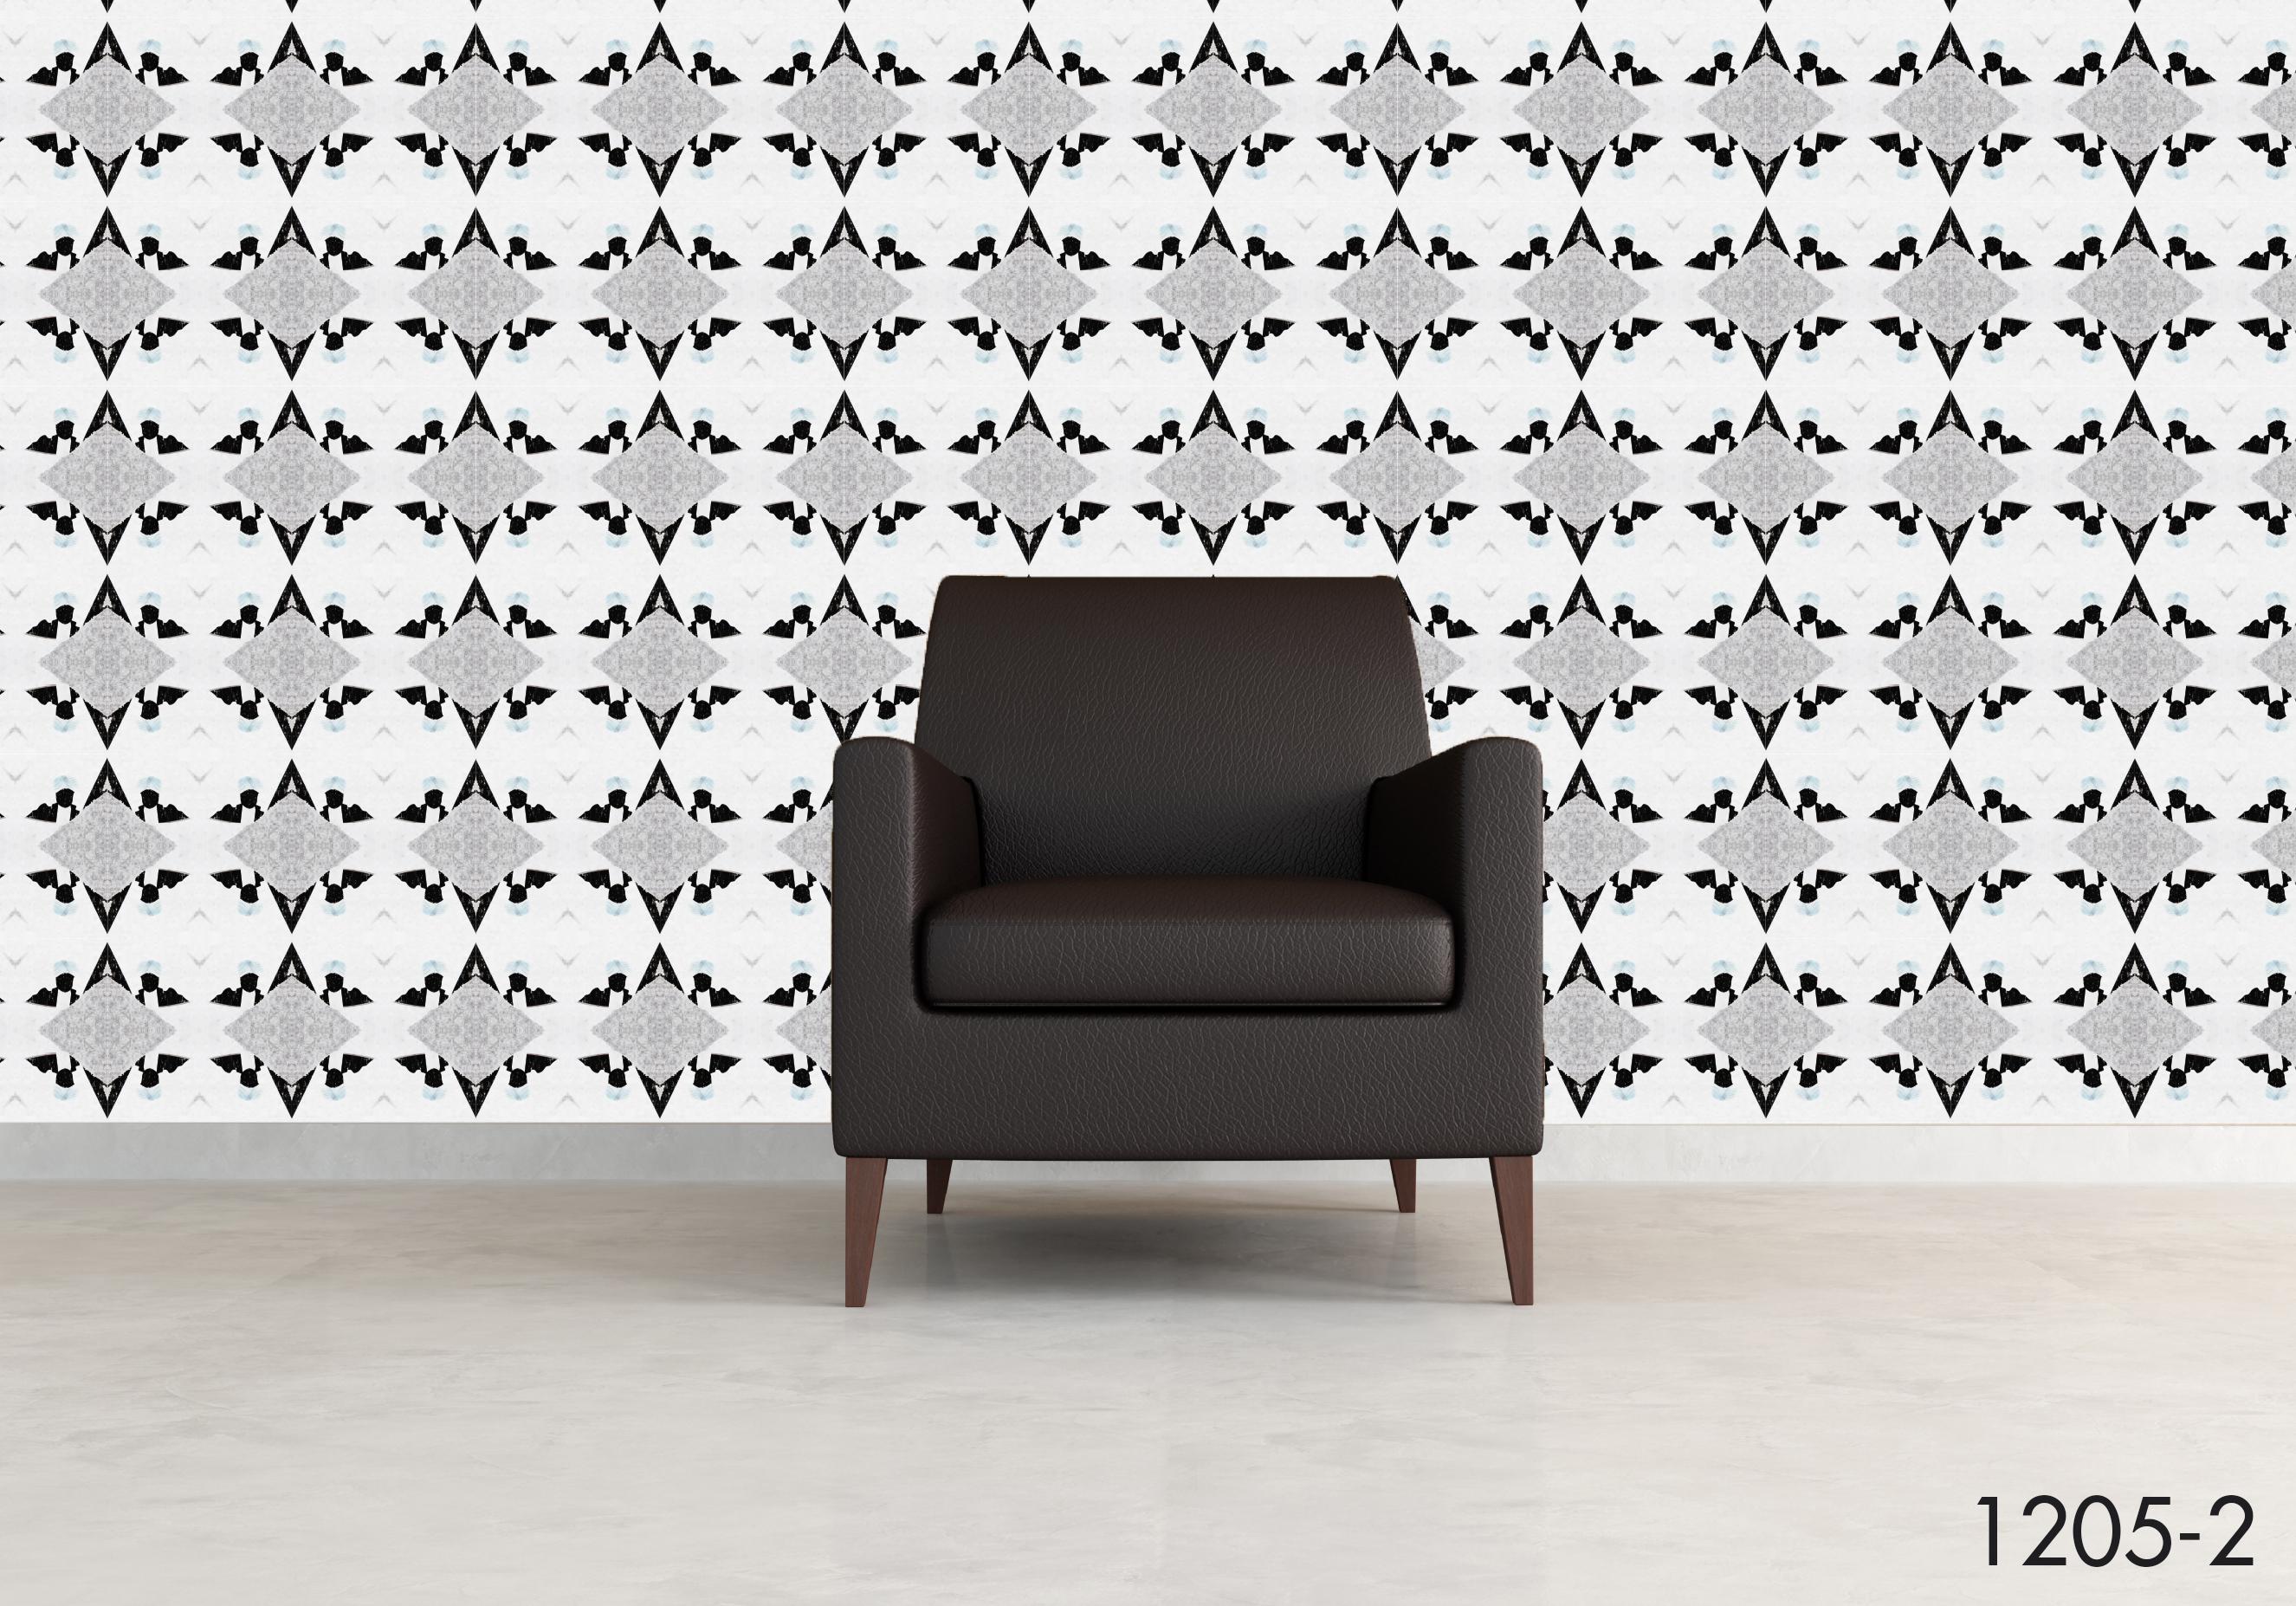 image wallcover